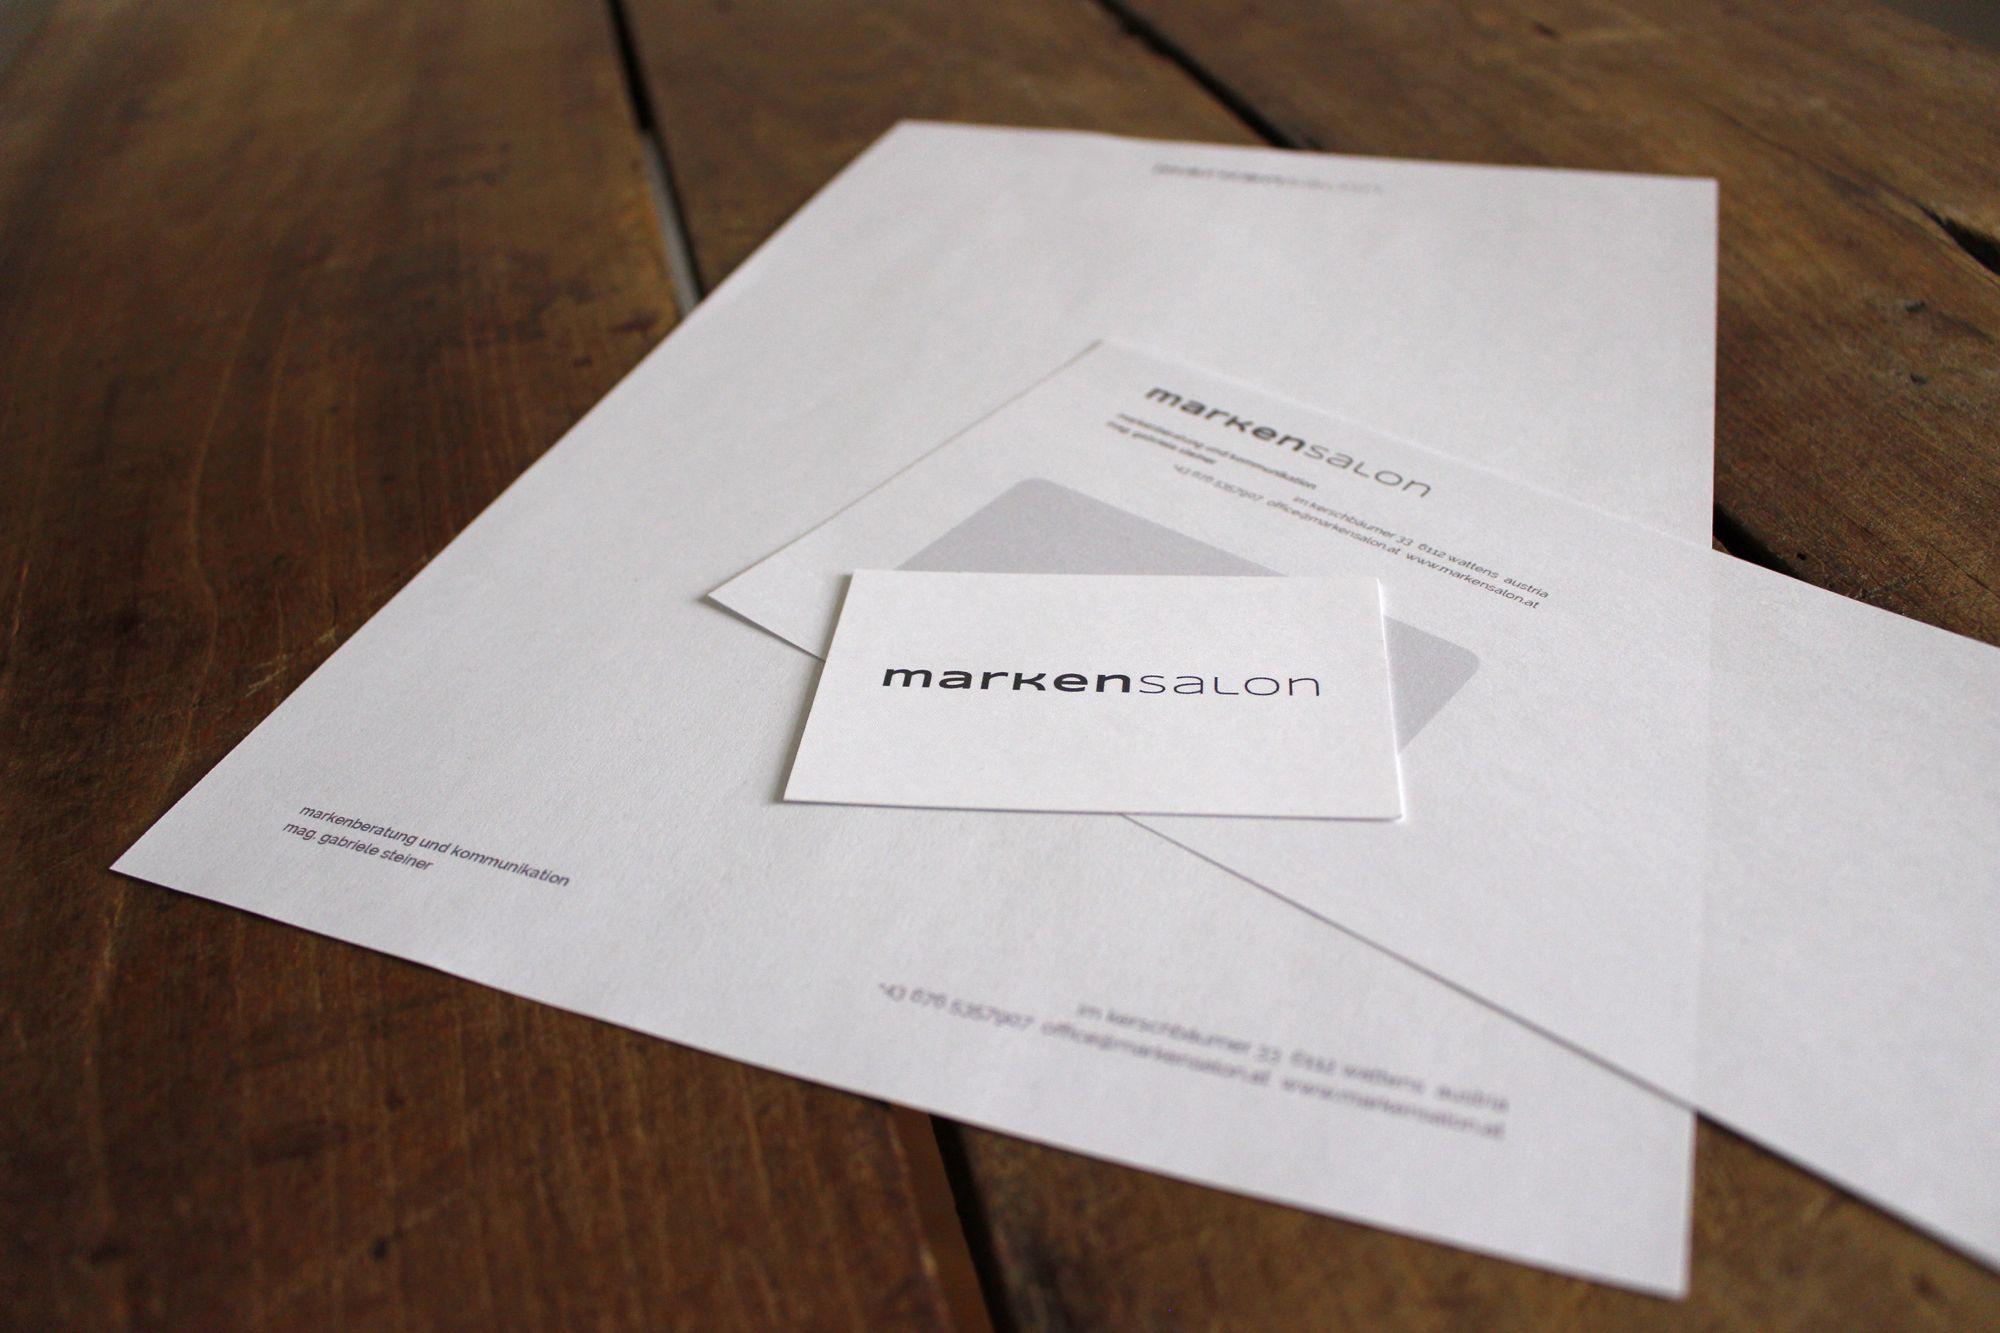 Geschäftsausstattung für markensalon